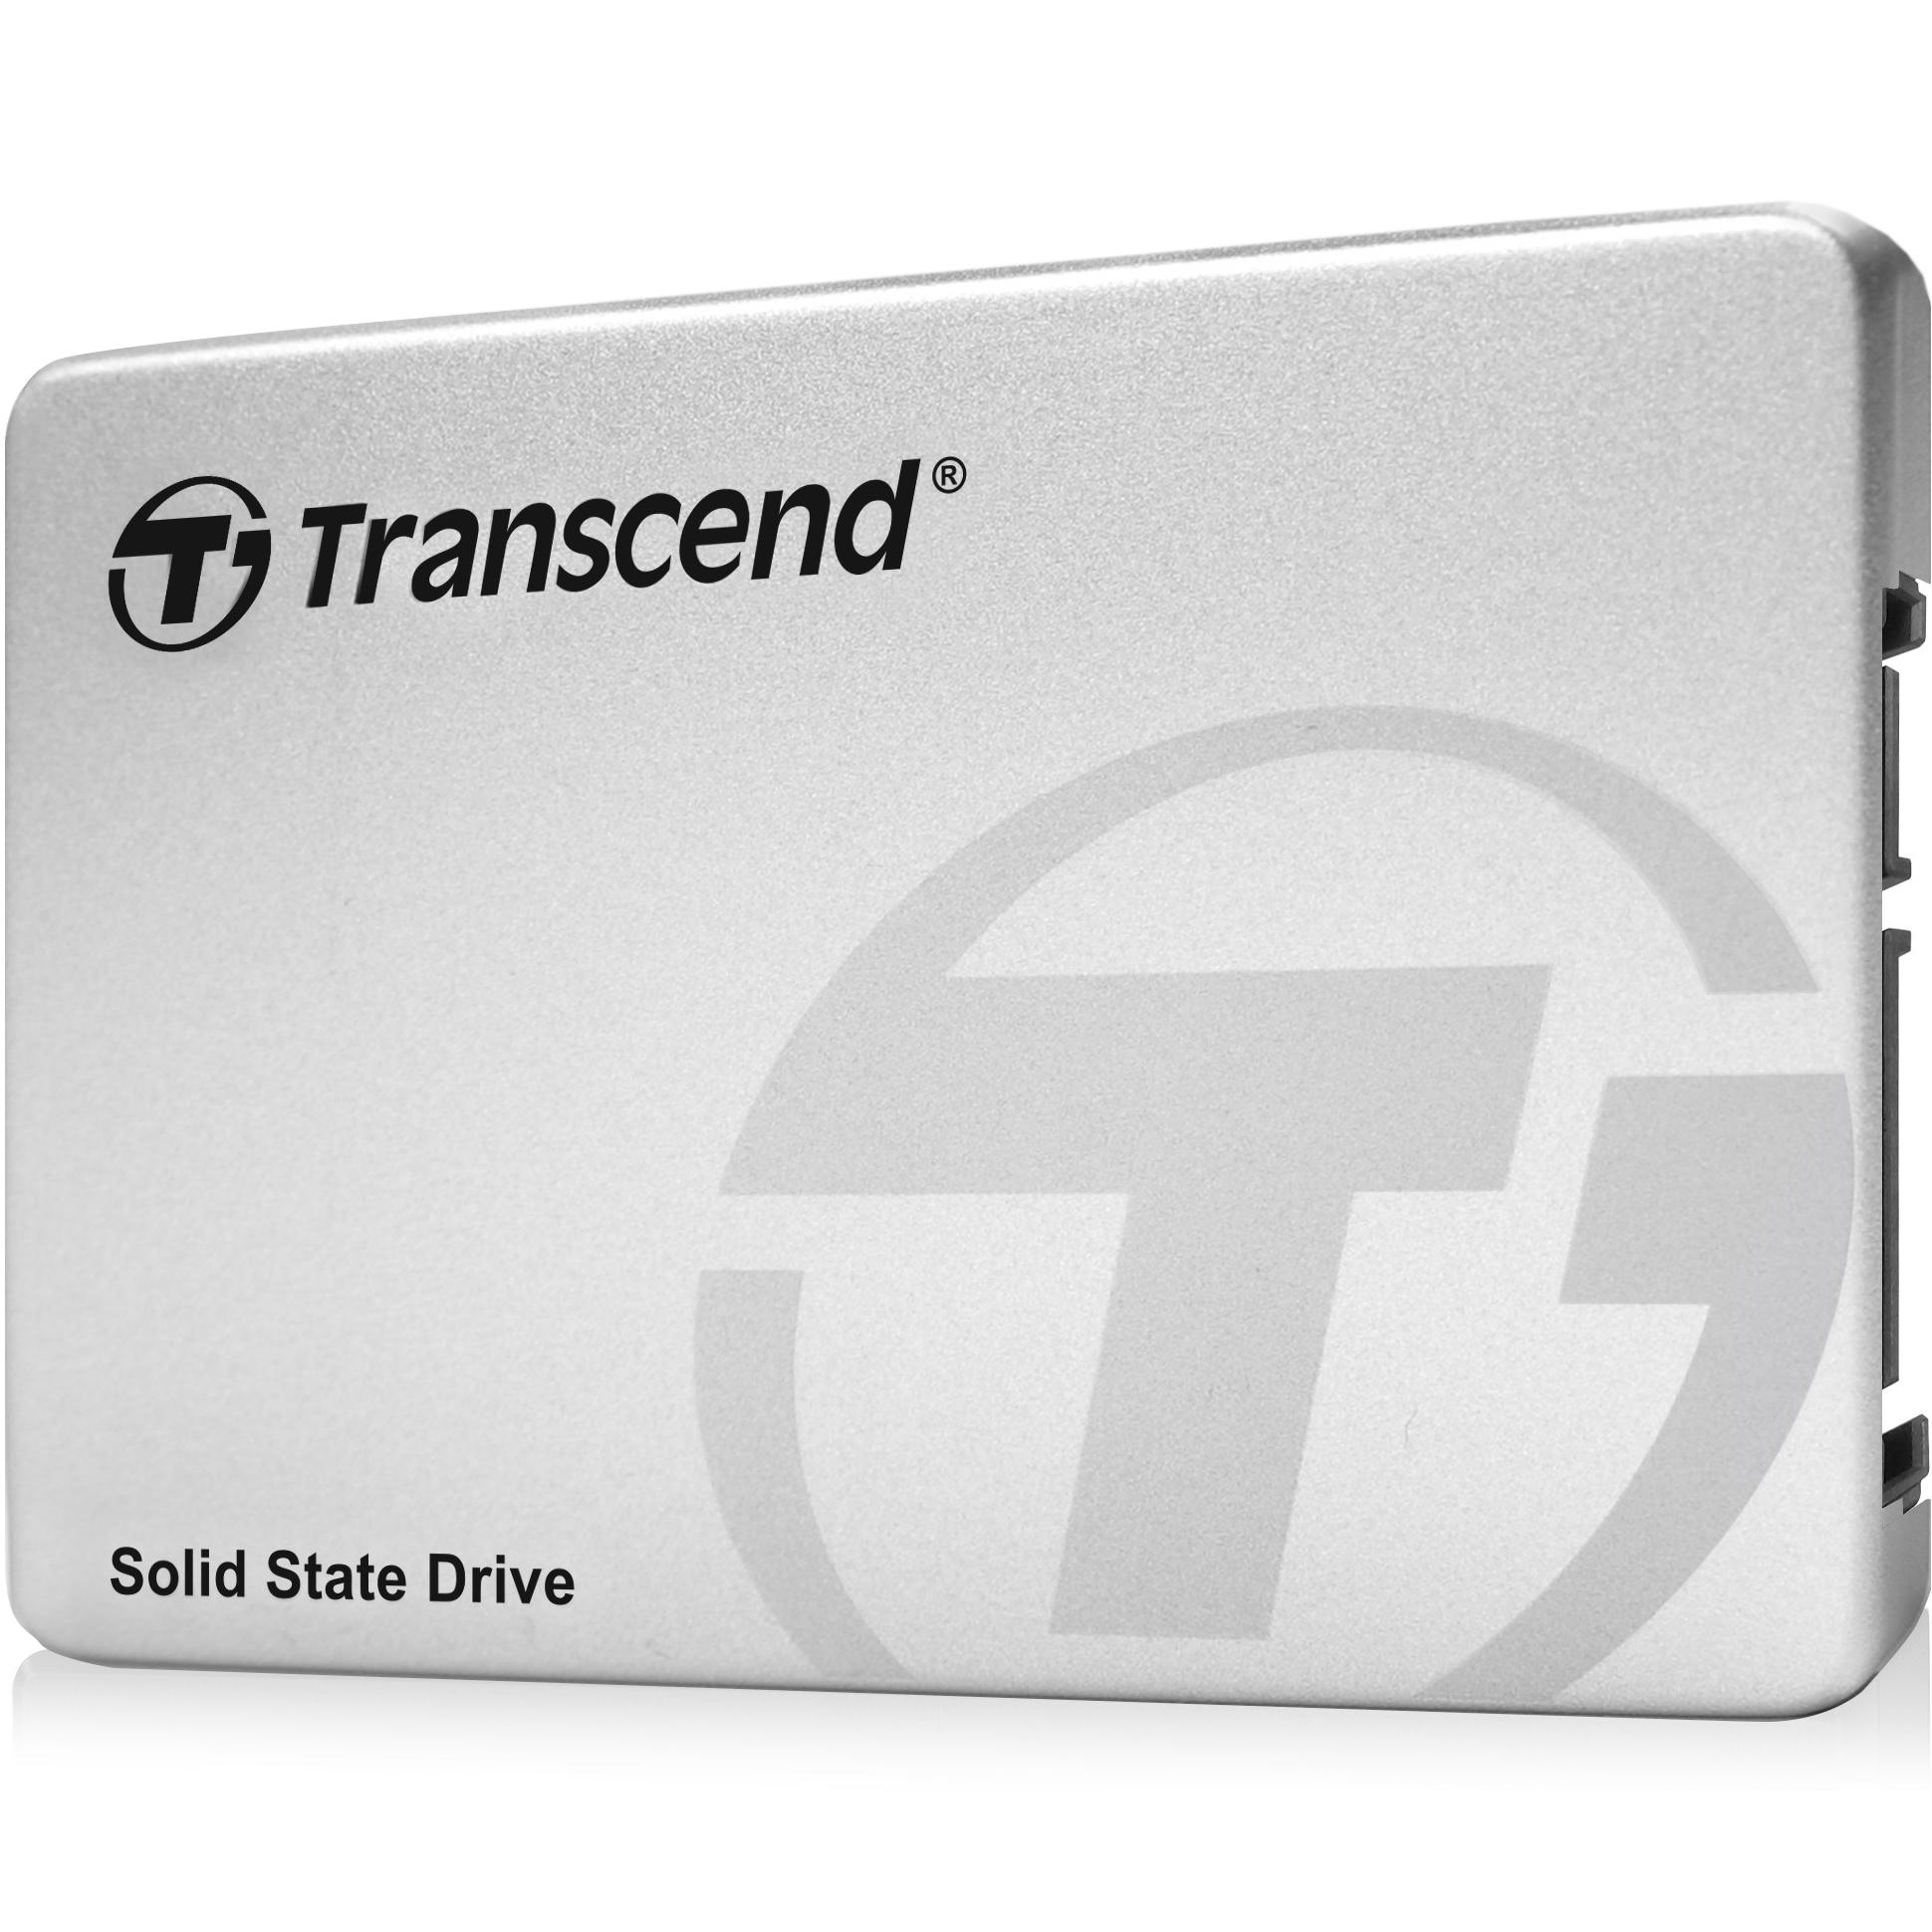 SSD SSD220 - 120 Go - Boîtier Aluminium